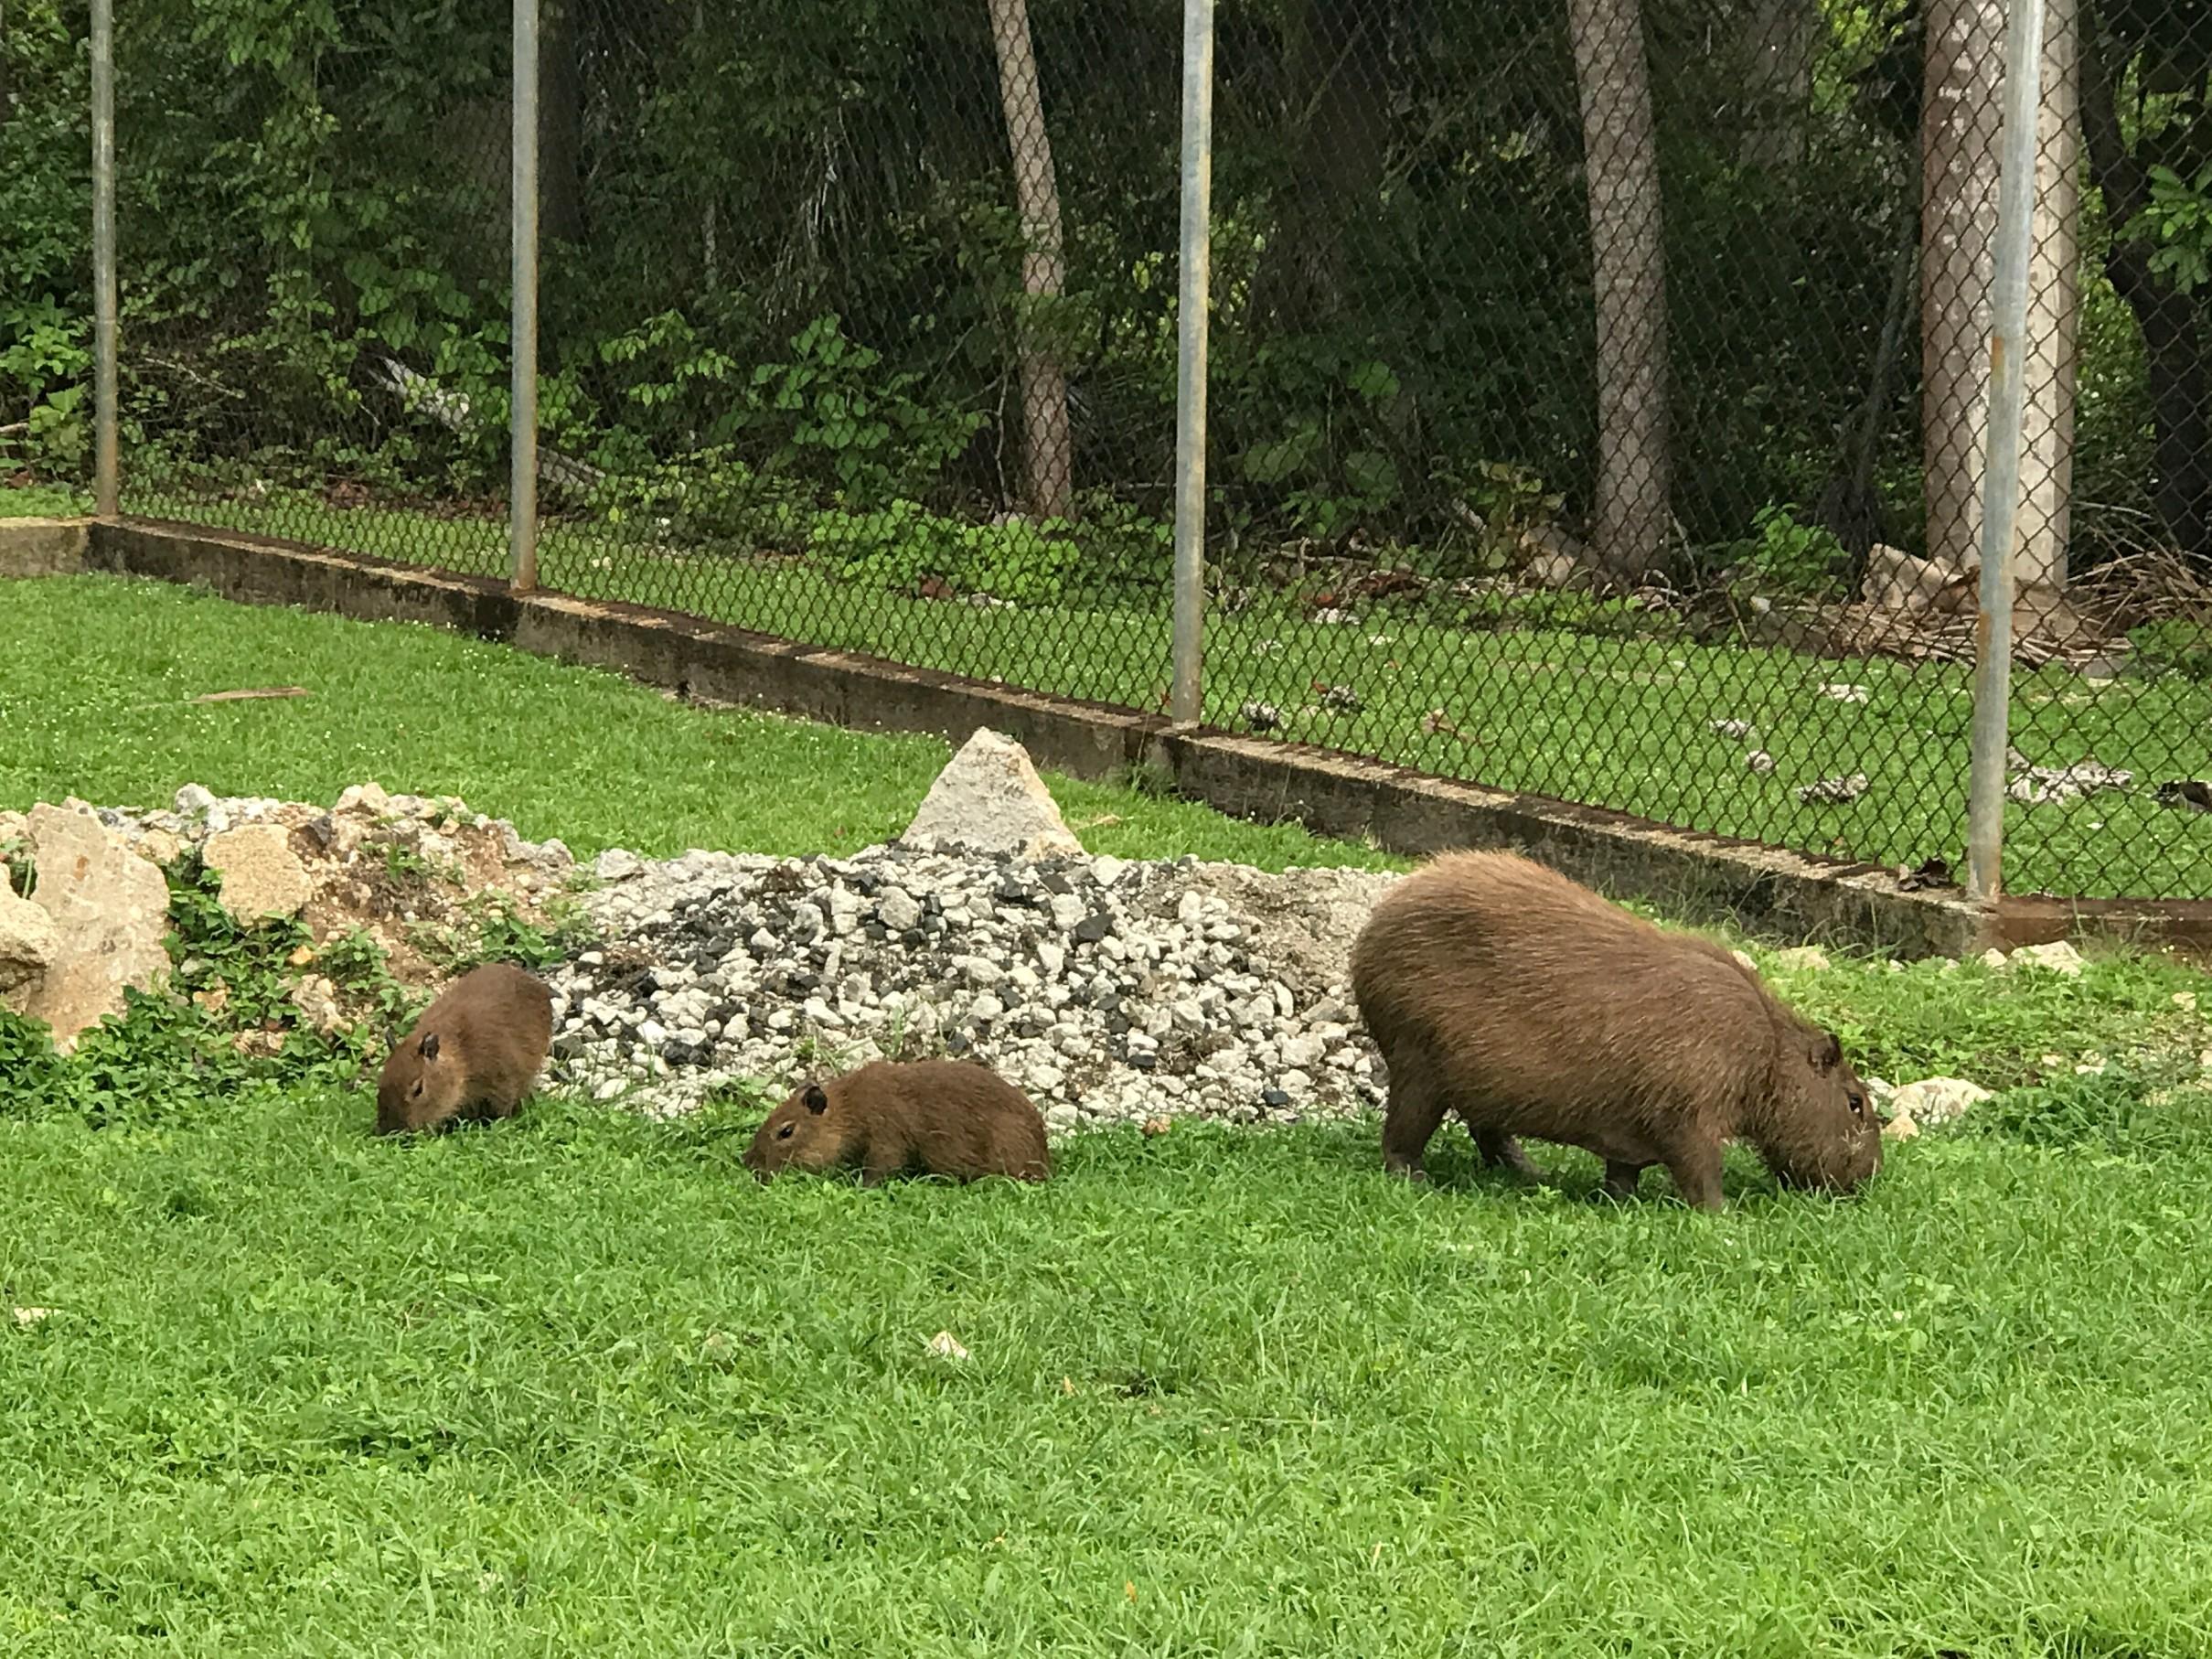 capybara in parking area.jpg